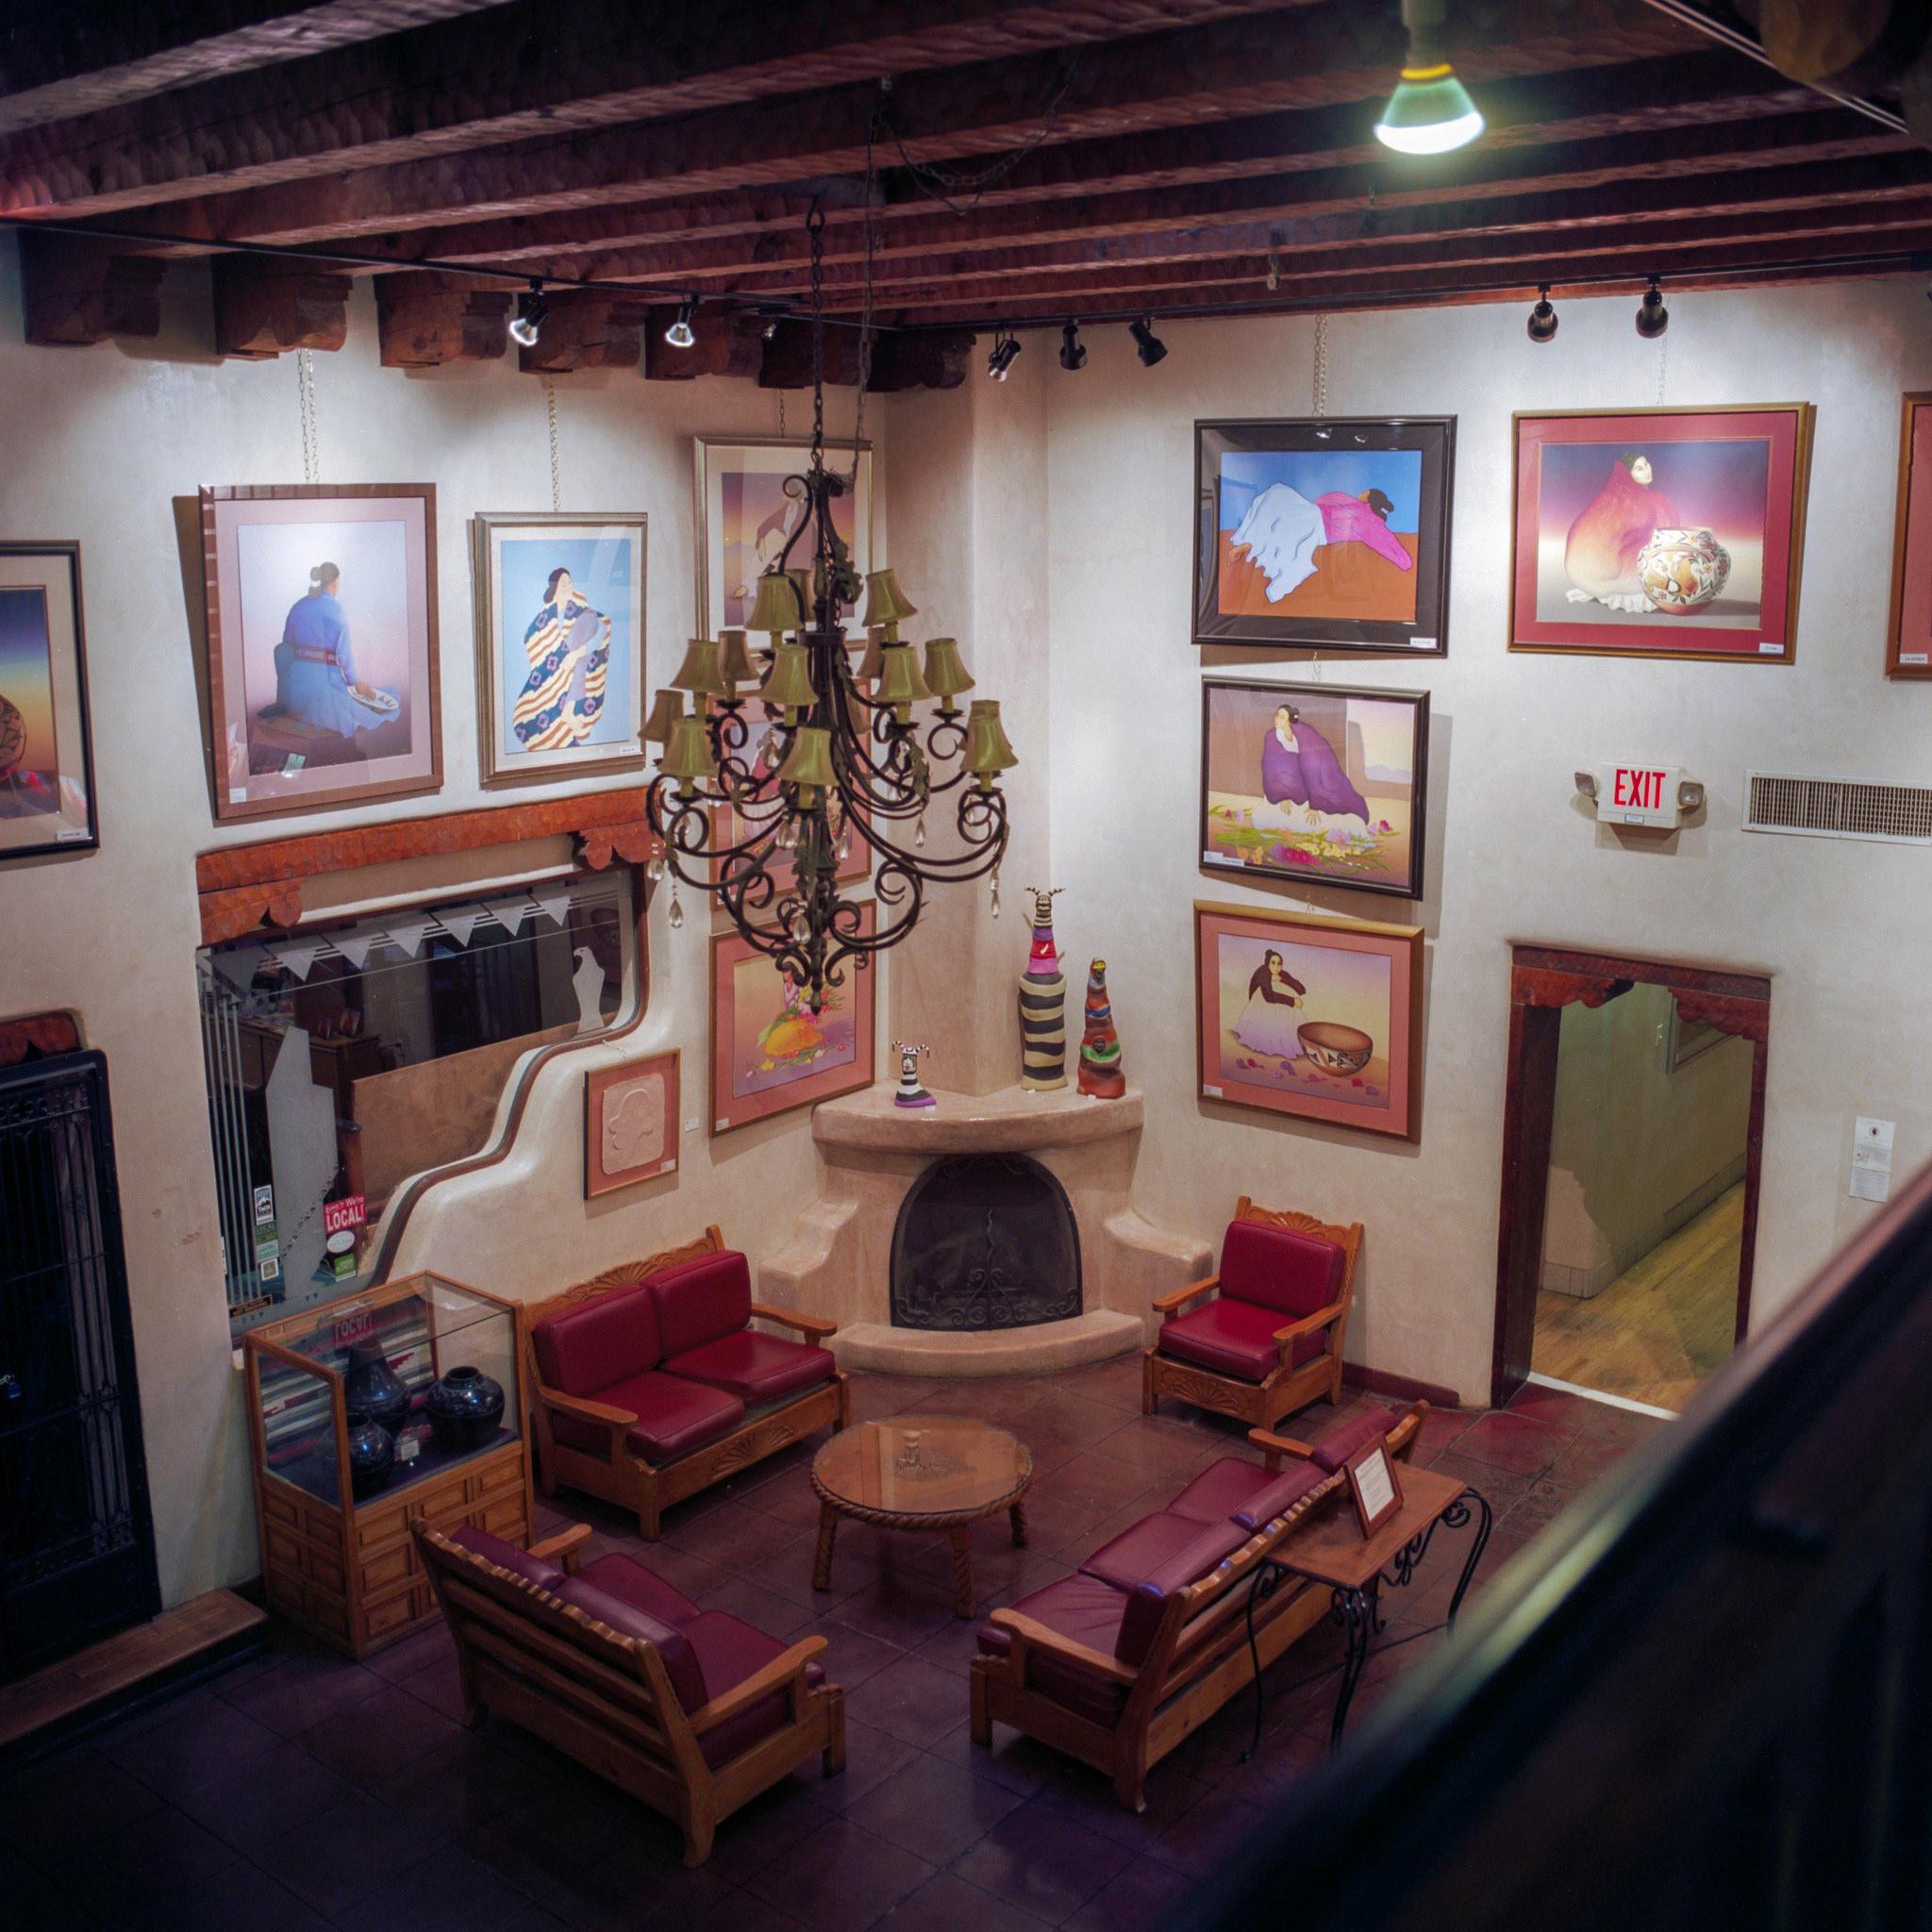 Eclectic lobby of the Hotel La Fonda de Taos, in Taos, NM.